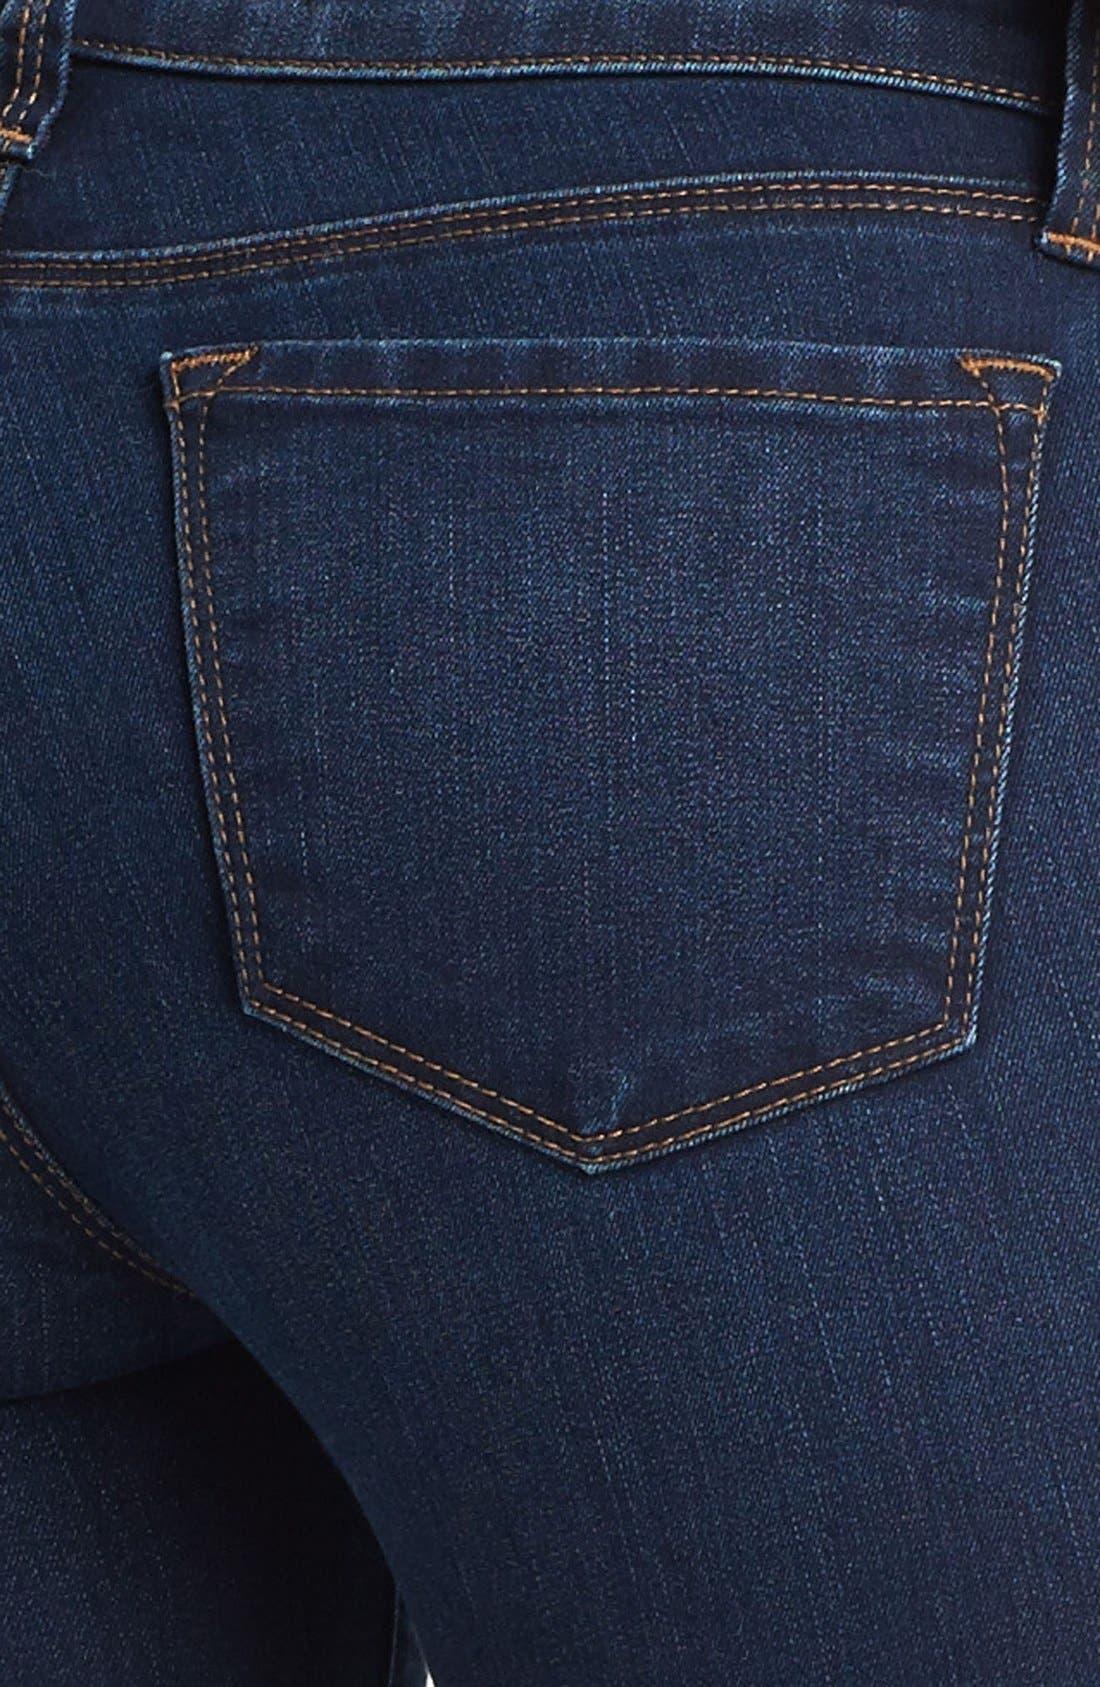 '811' Ankle Skinny Jeans,                             Alternate thumbnail 27, color,